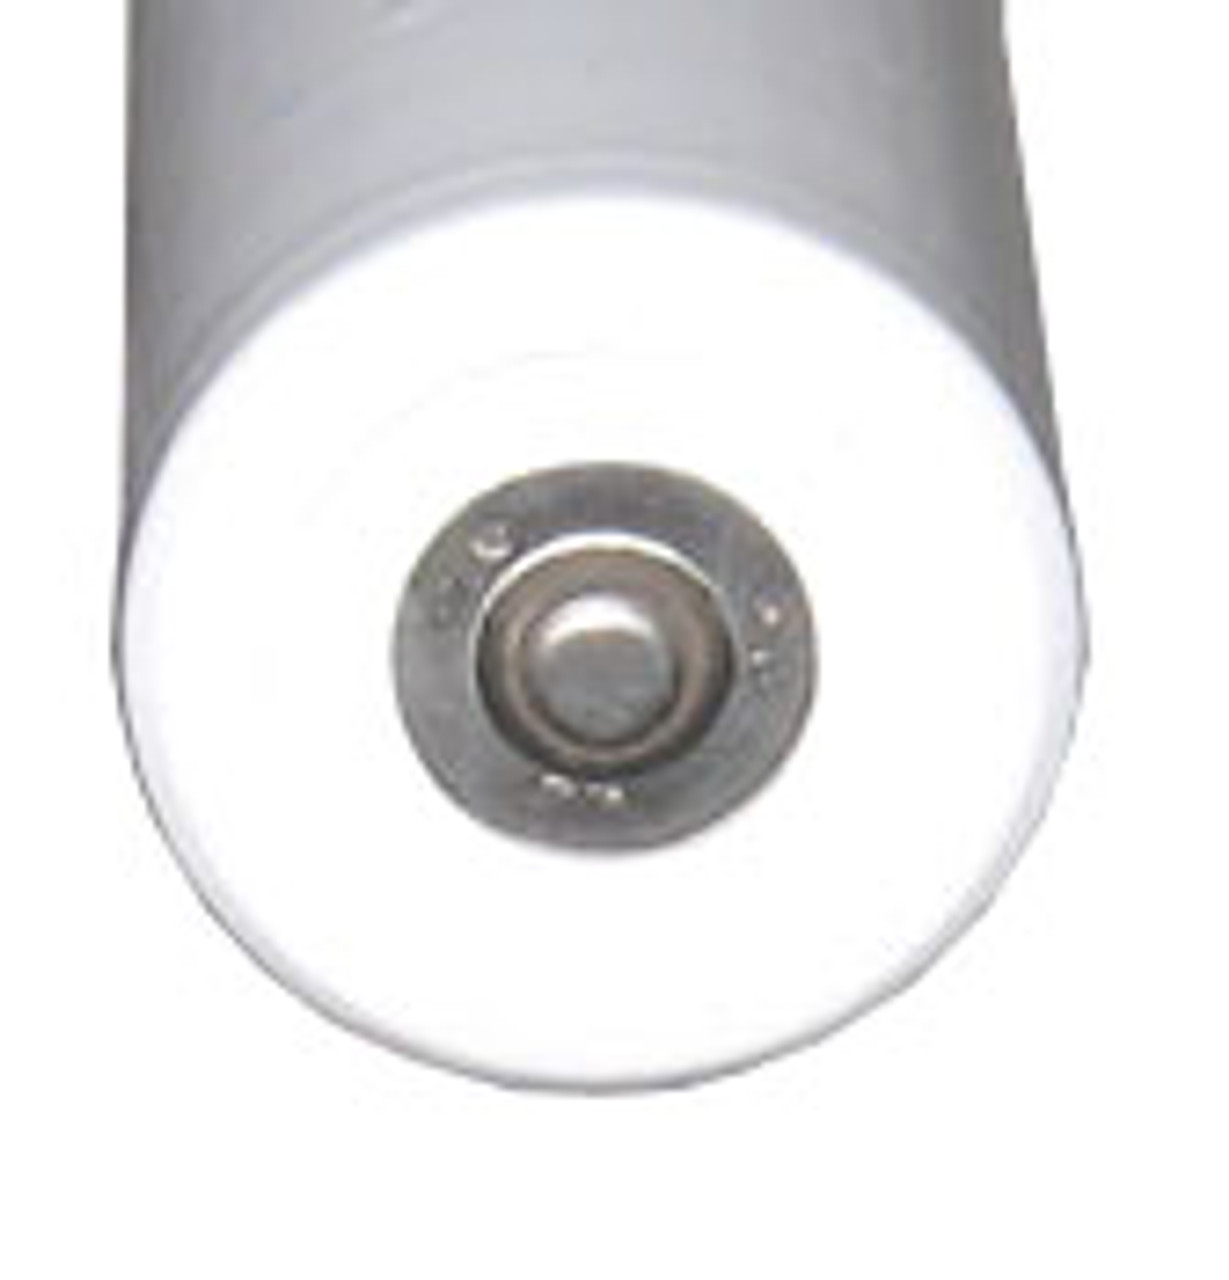 Streamlight SL20XP Flashlight Battery - 6 Volt 1600mAh Stick